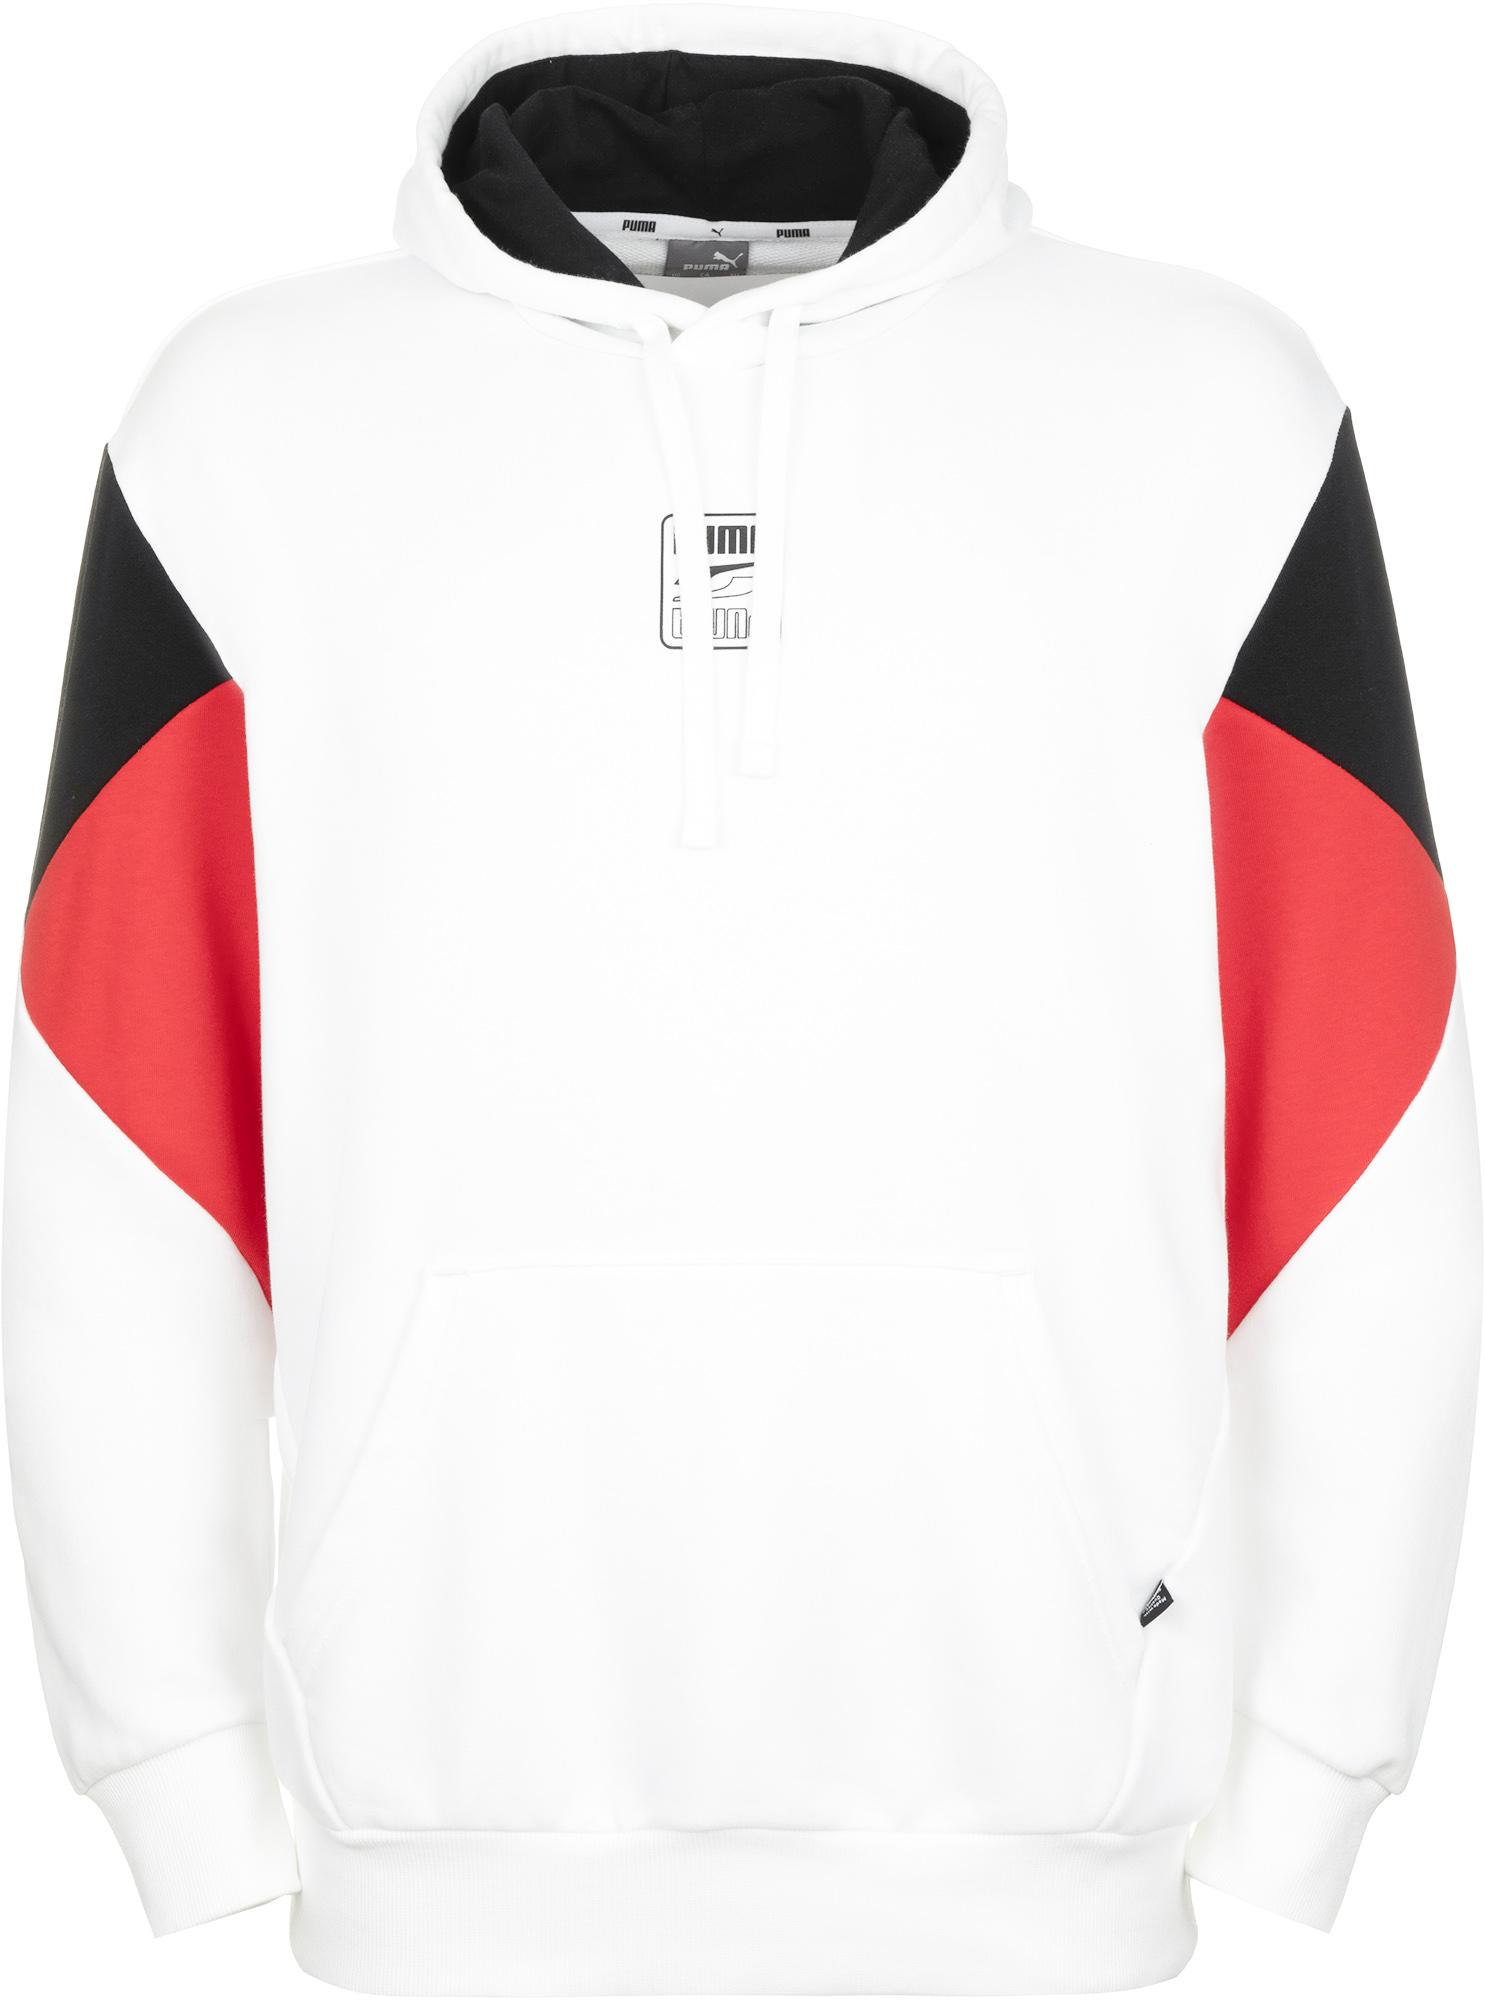 пуховик женский puma 70 30 480 down jacket цвет молочный 85166611 размер m 44 46 Puma Худи мужская Puma Rebel, размер 44-46